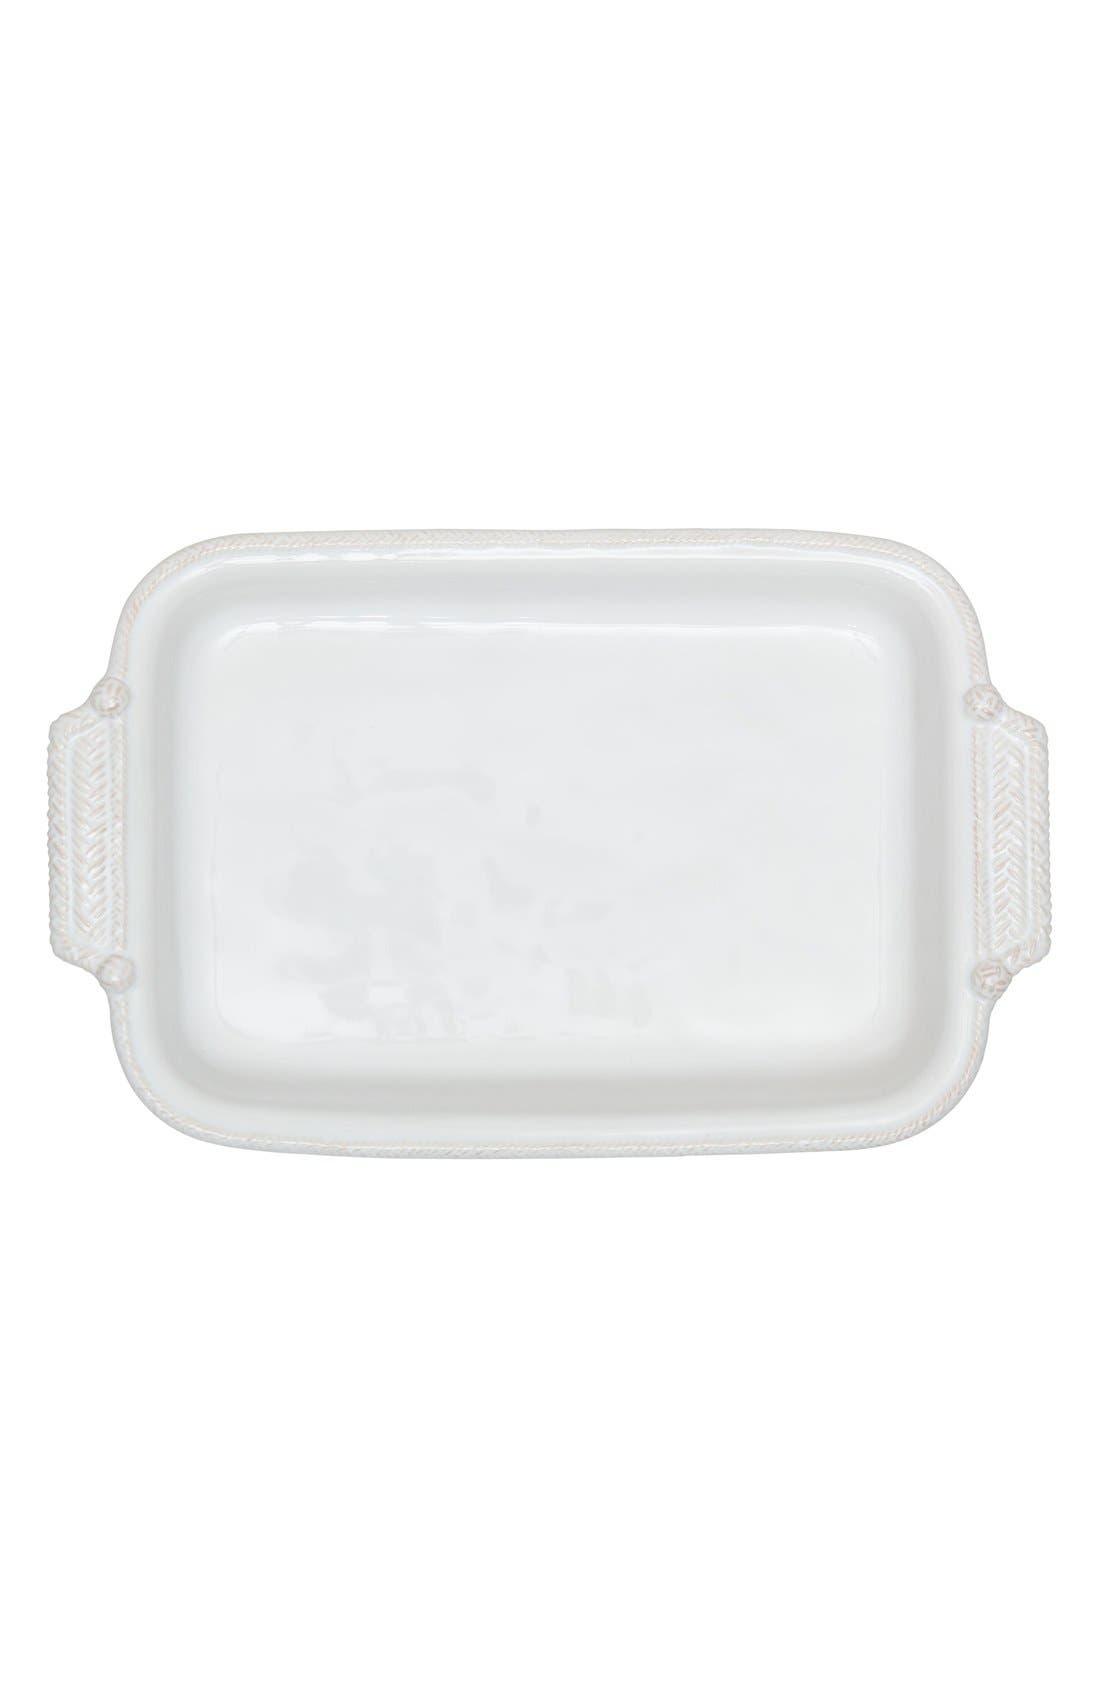 Alternate Image 1 Selected - Juliska Le Panier 2.5-Quart Rectangular Baking Dish